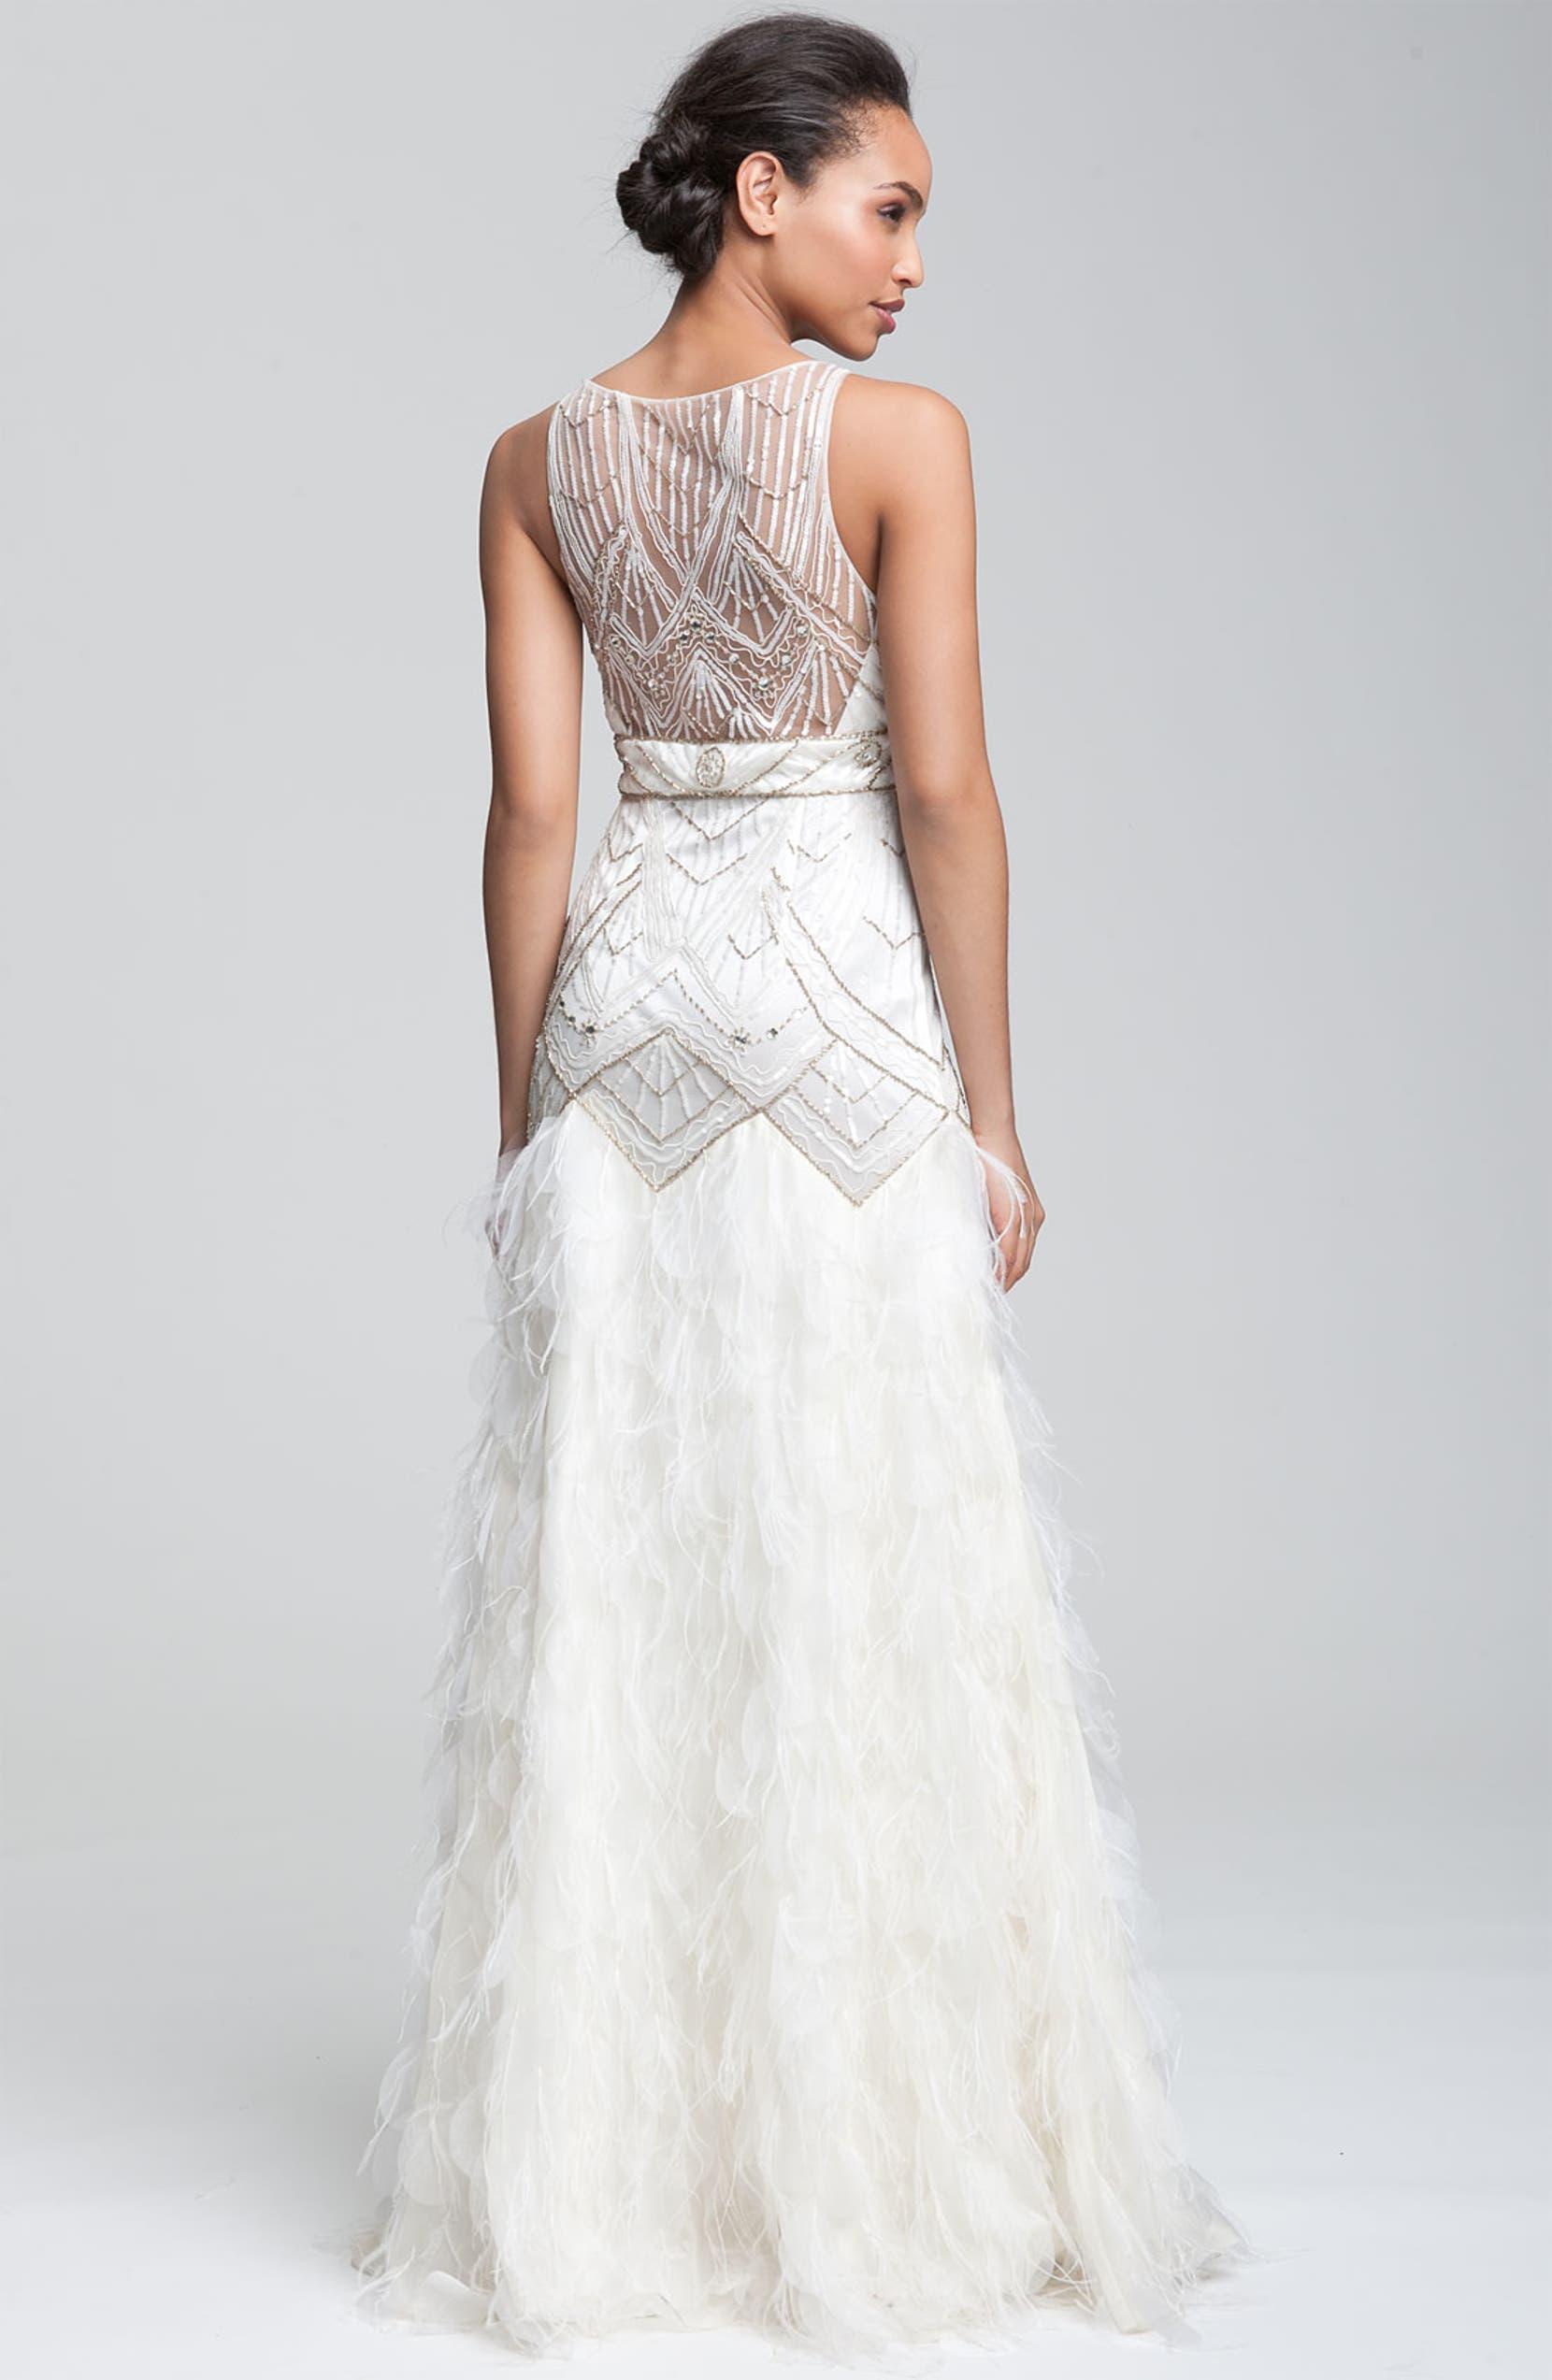 Sue Wong Wedding Dresses Nordstrom - Image Wedding Dress Imagemax.co